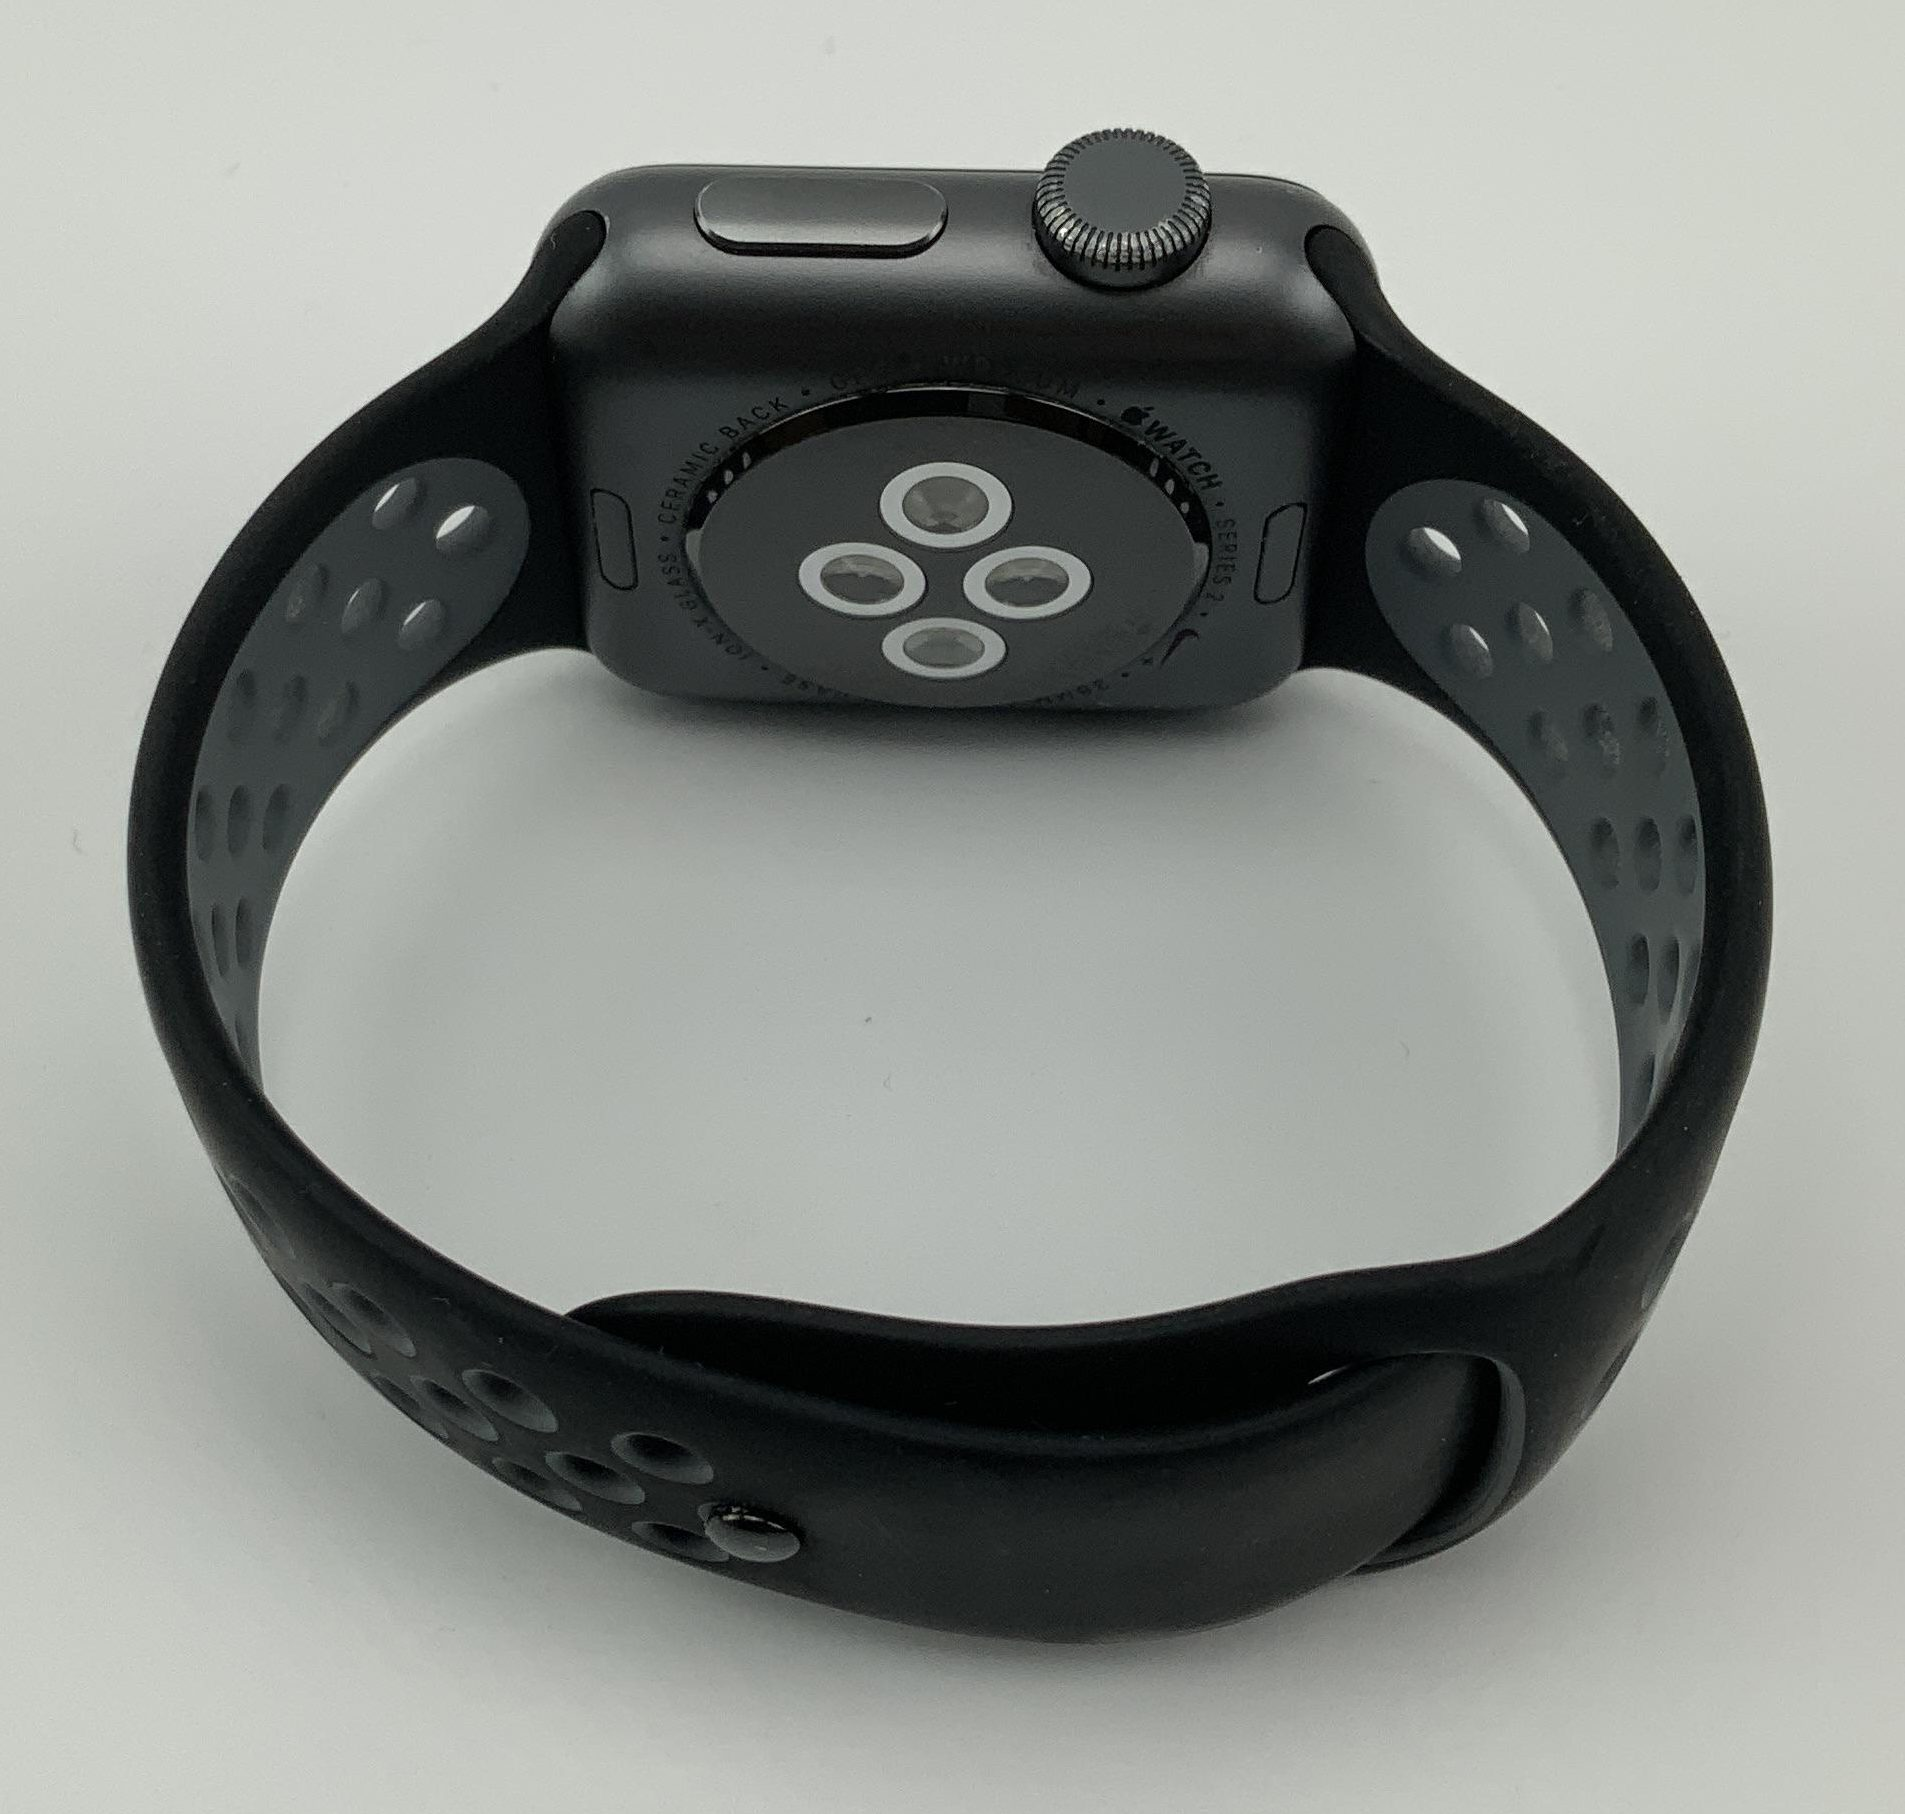 Watch Series 2 Aluminum (38mm), Space Gray, Anthracite/Black Nike Sport Band, Kuva 3